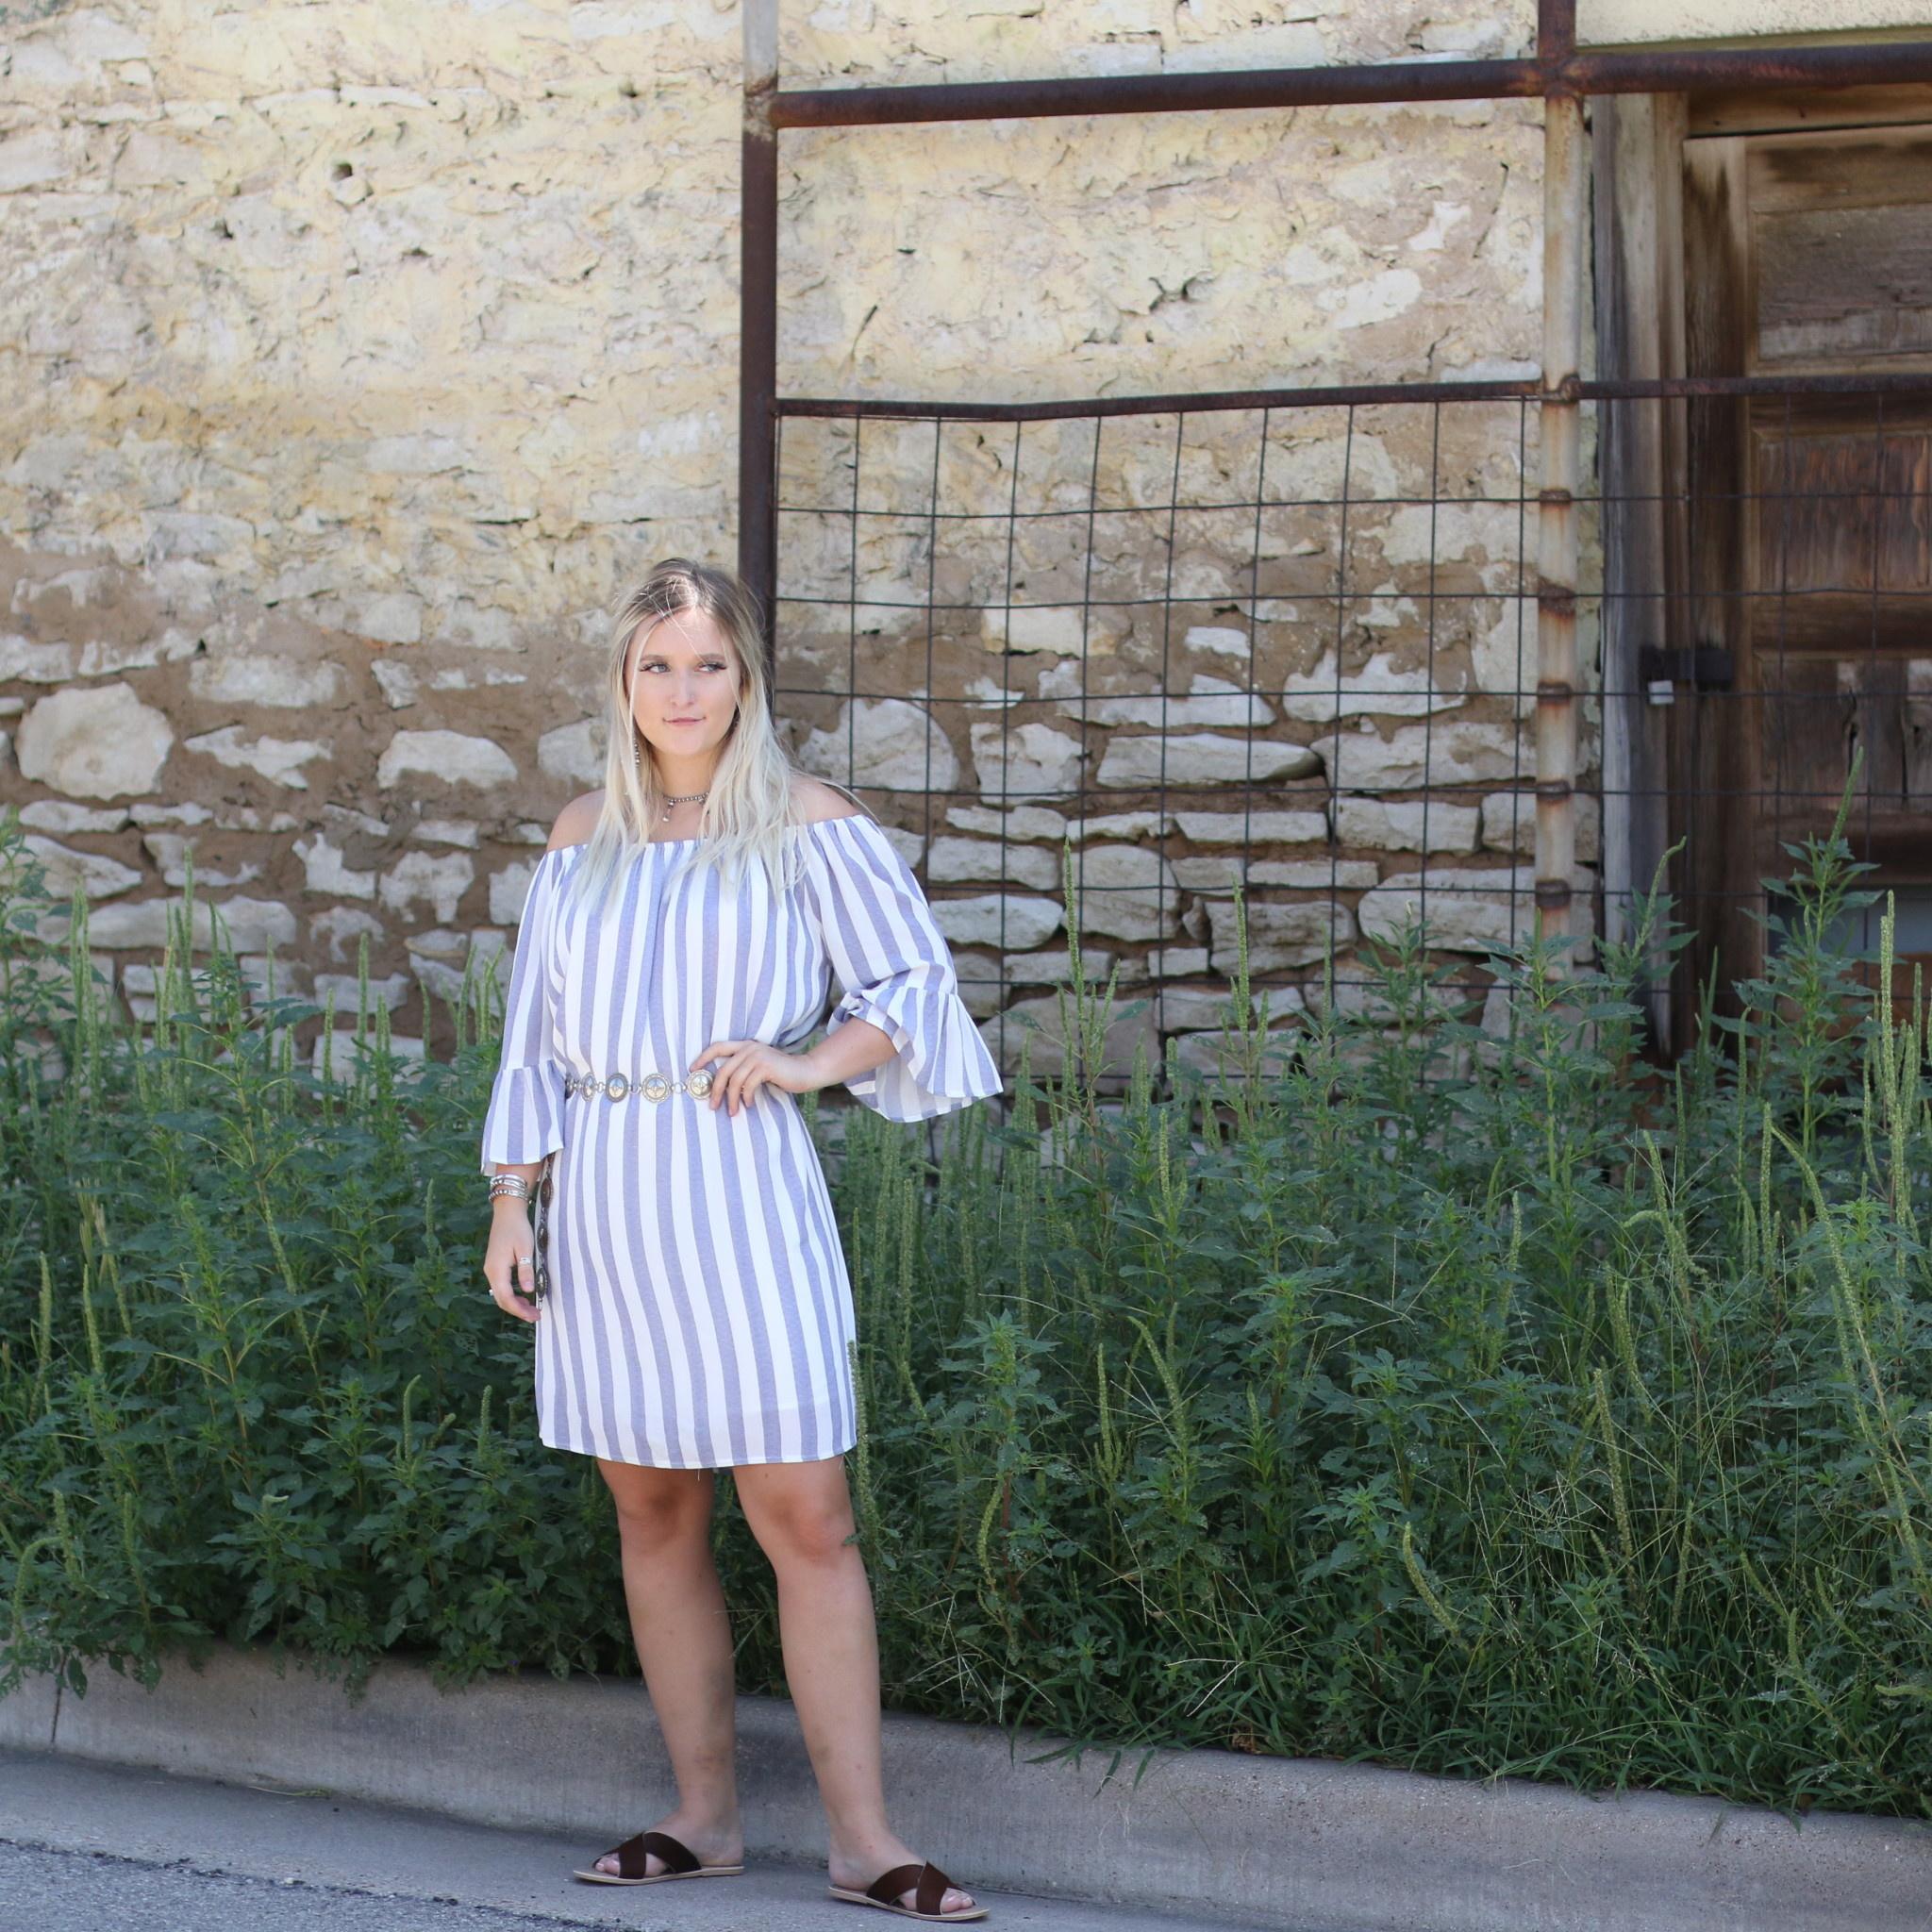 Punchy's Blue & White Striped Off Shoulder Dress